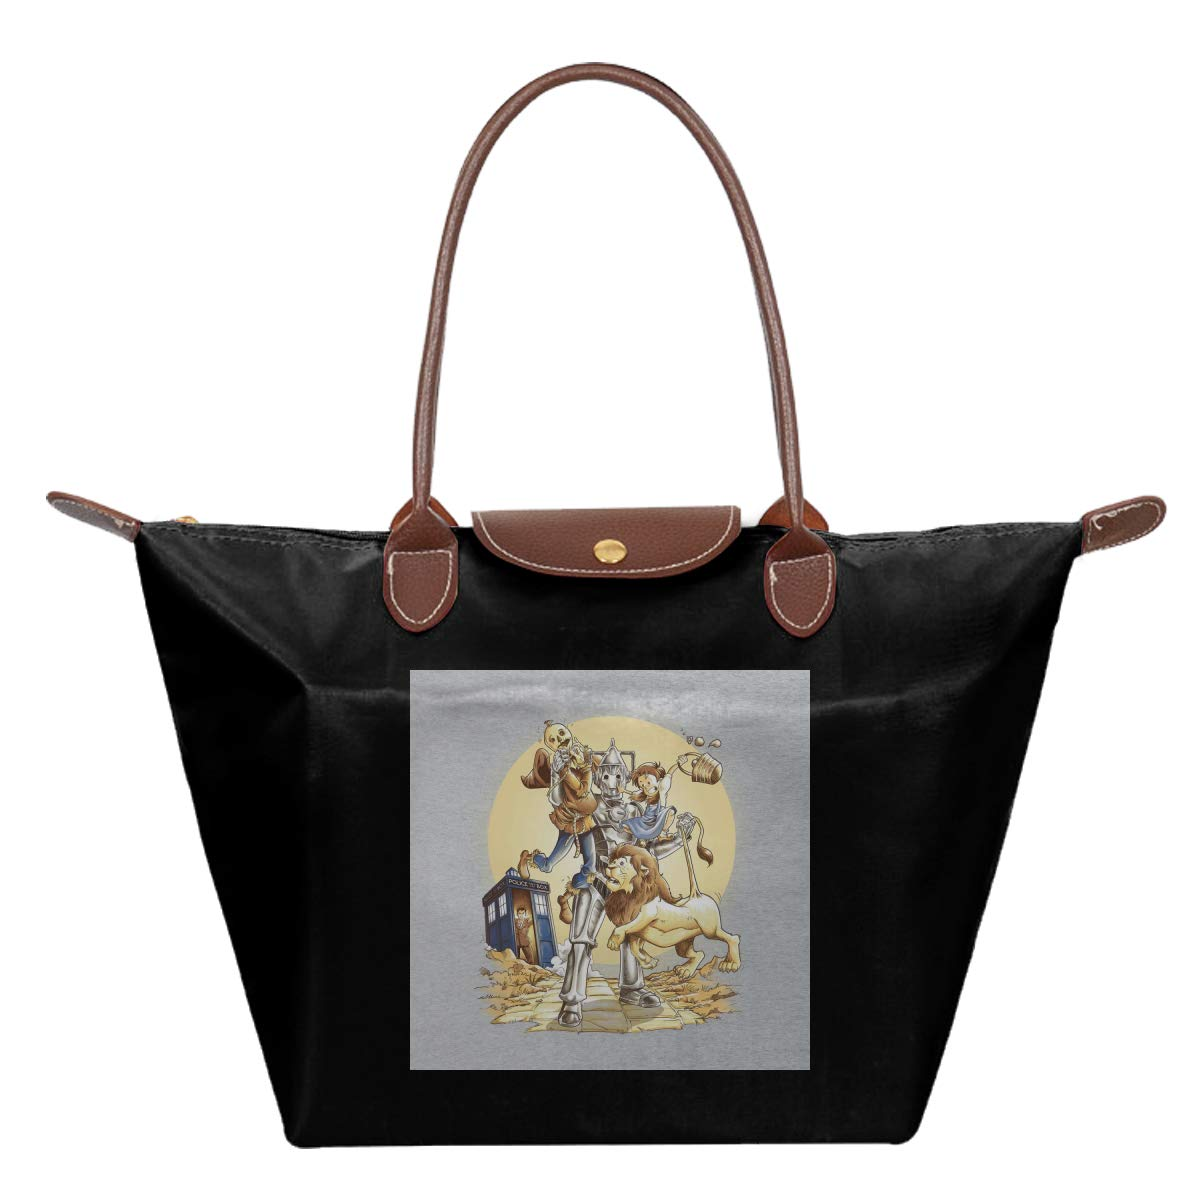 Doctor Who Wizard Planet Of Oz Waterproof Leather Folded Messenger Nylon Bag Travel Tote Hopping Folding School Handbags